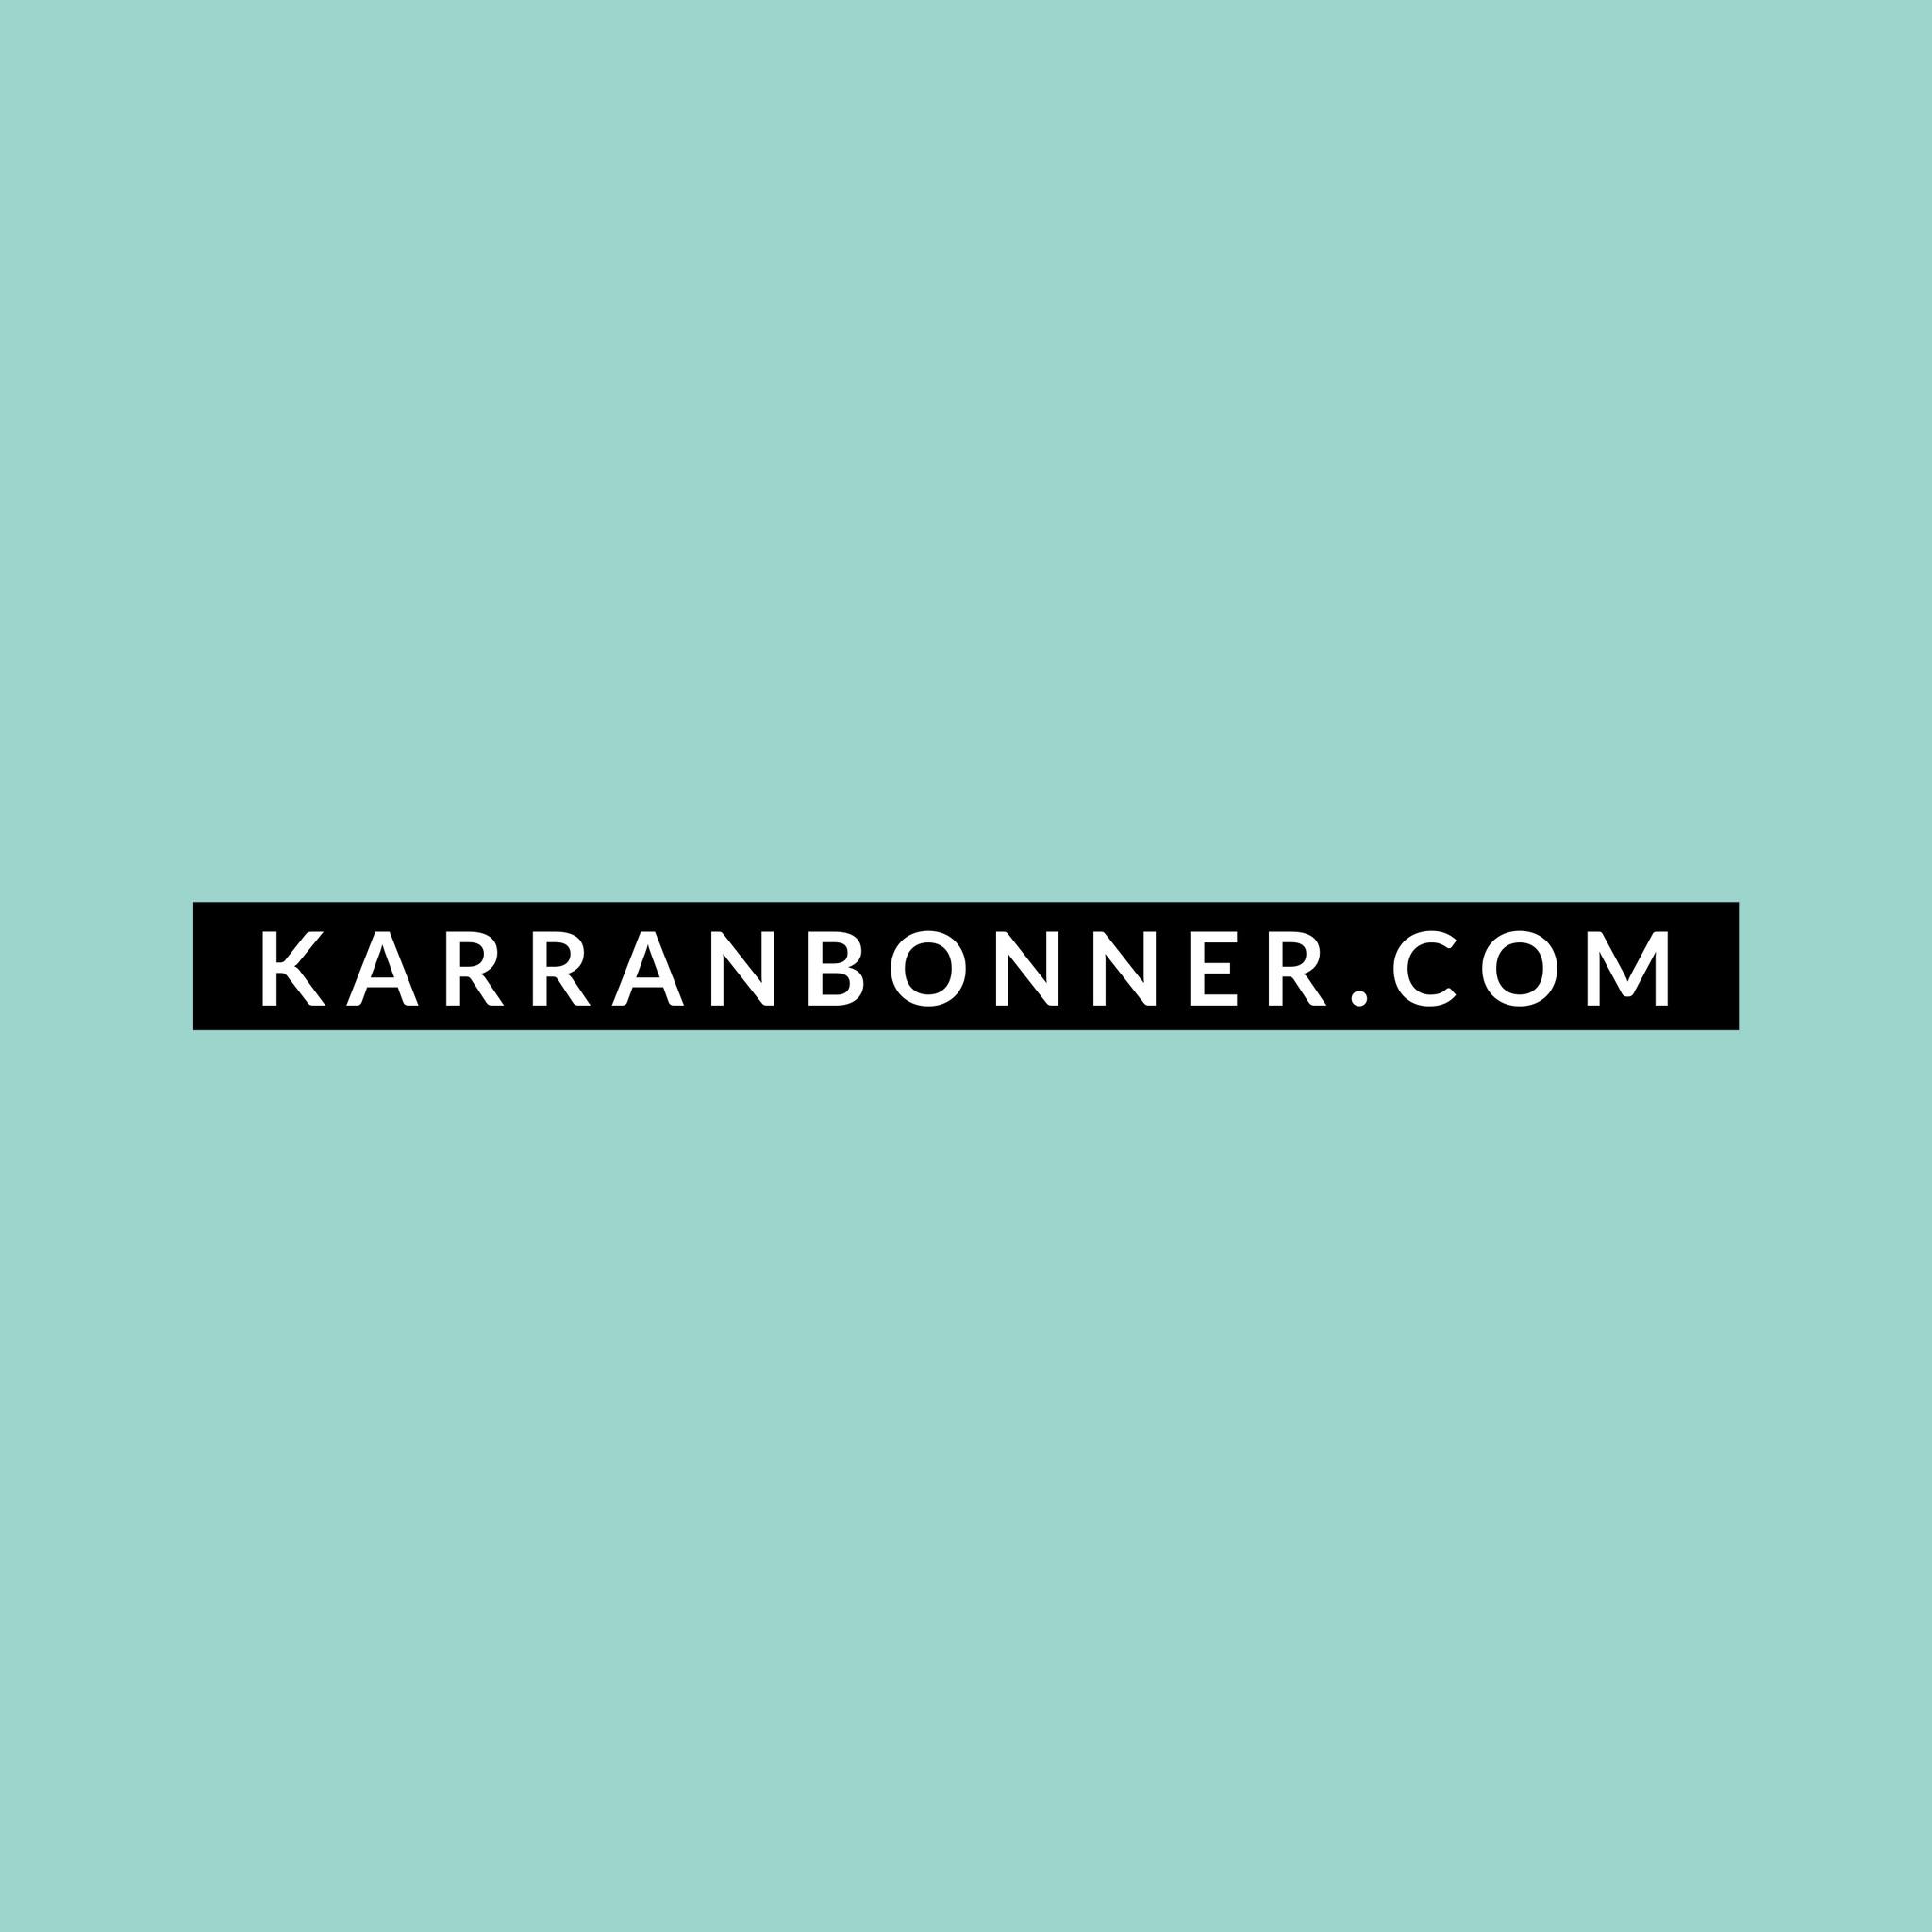 Karran Bonner